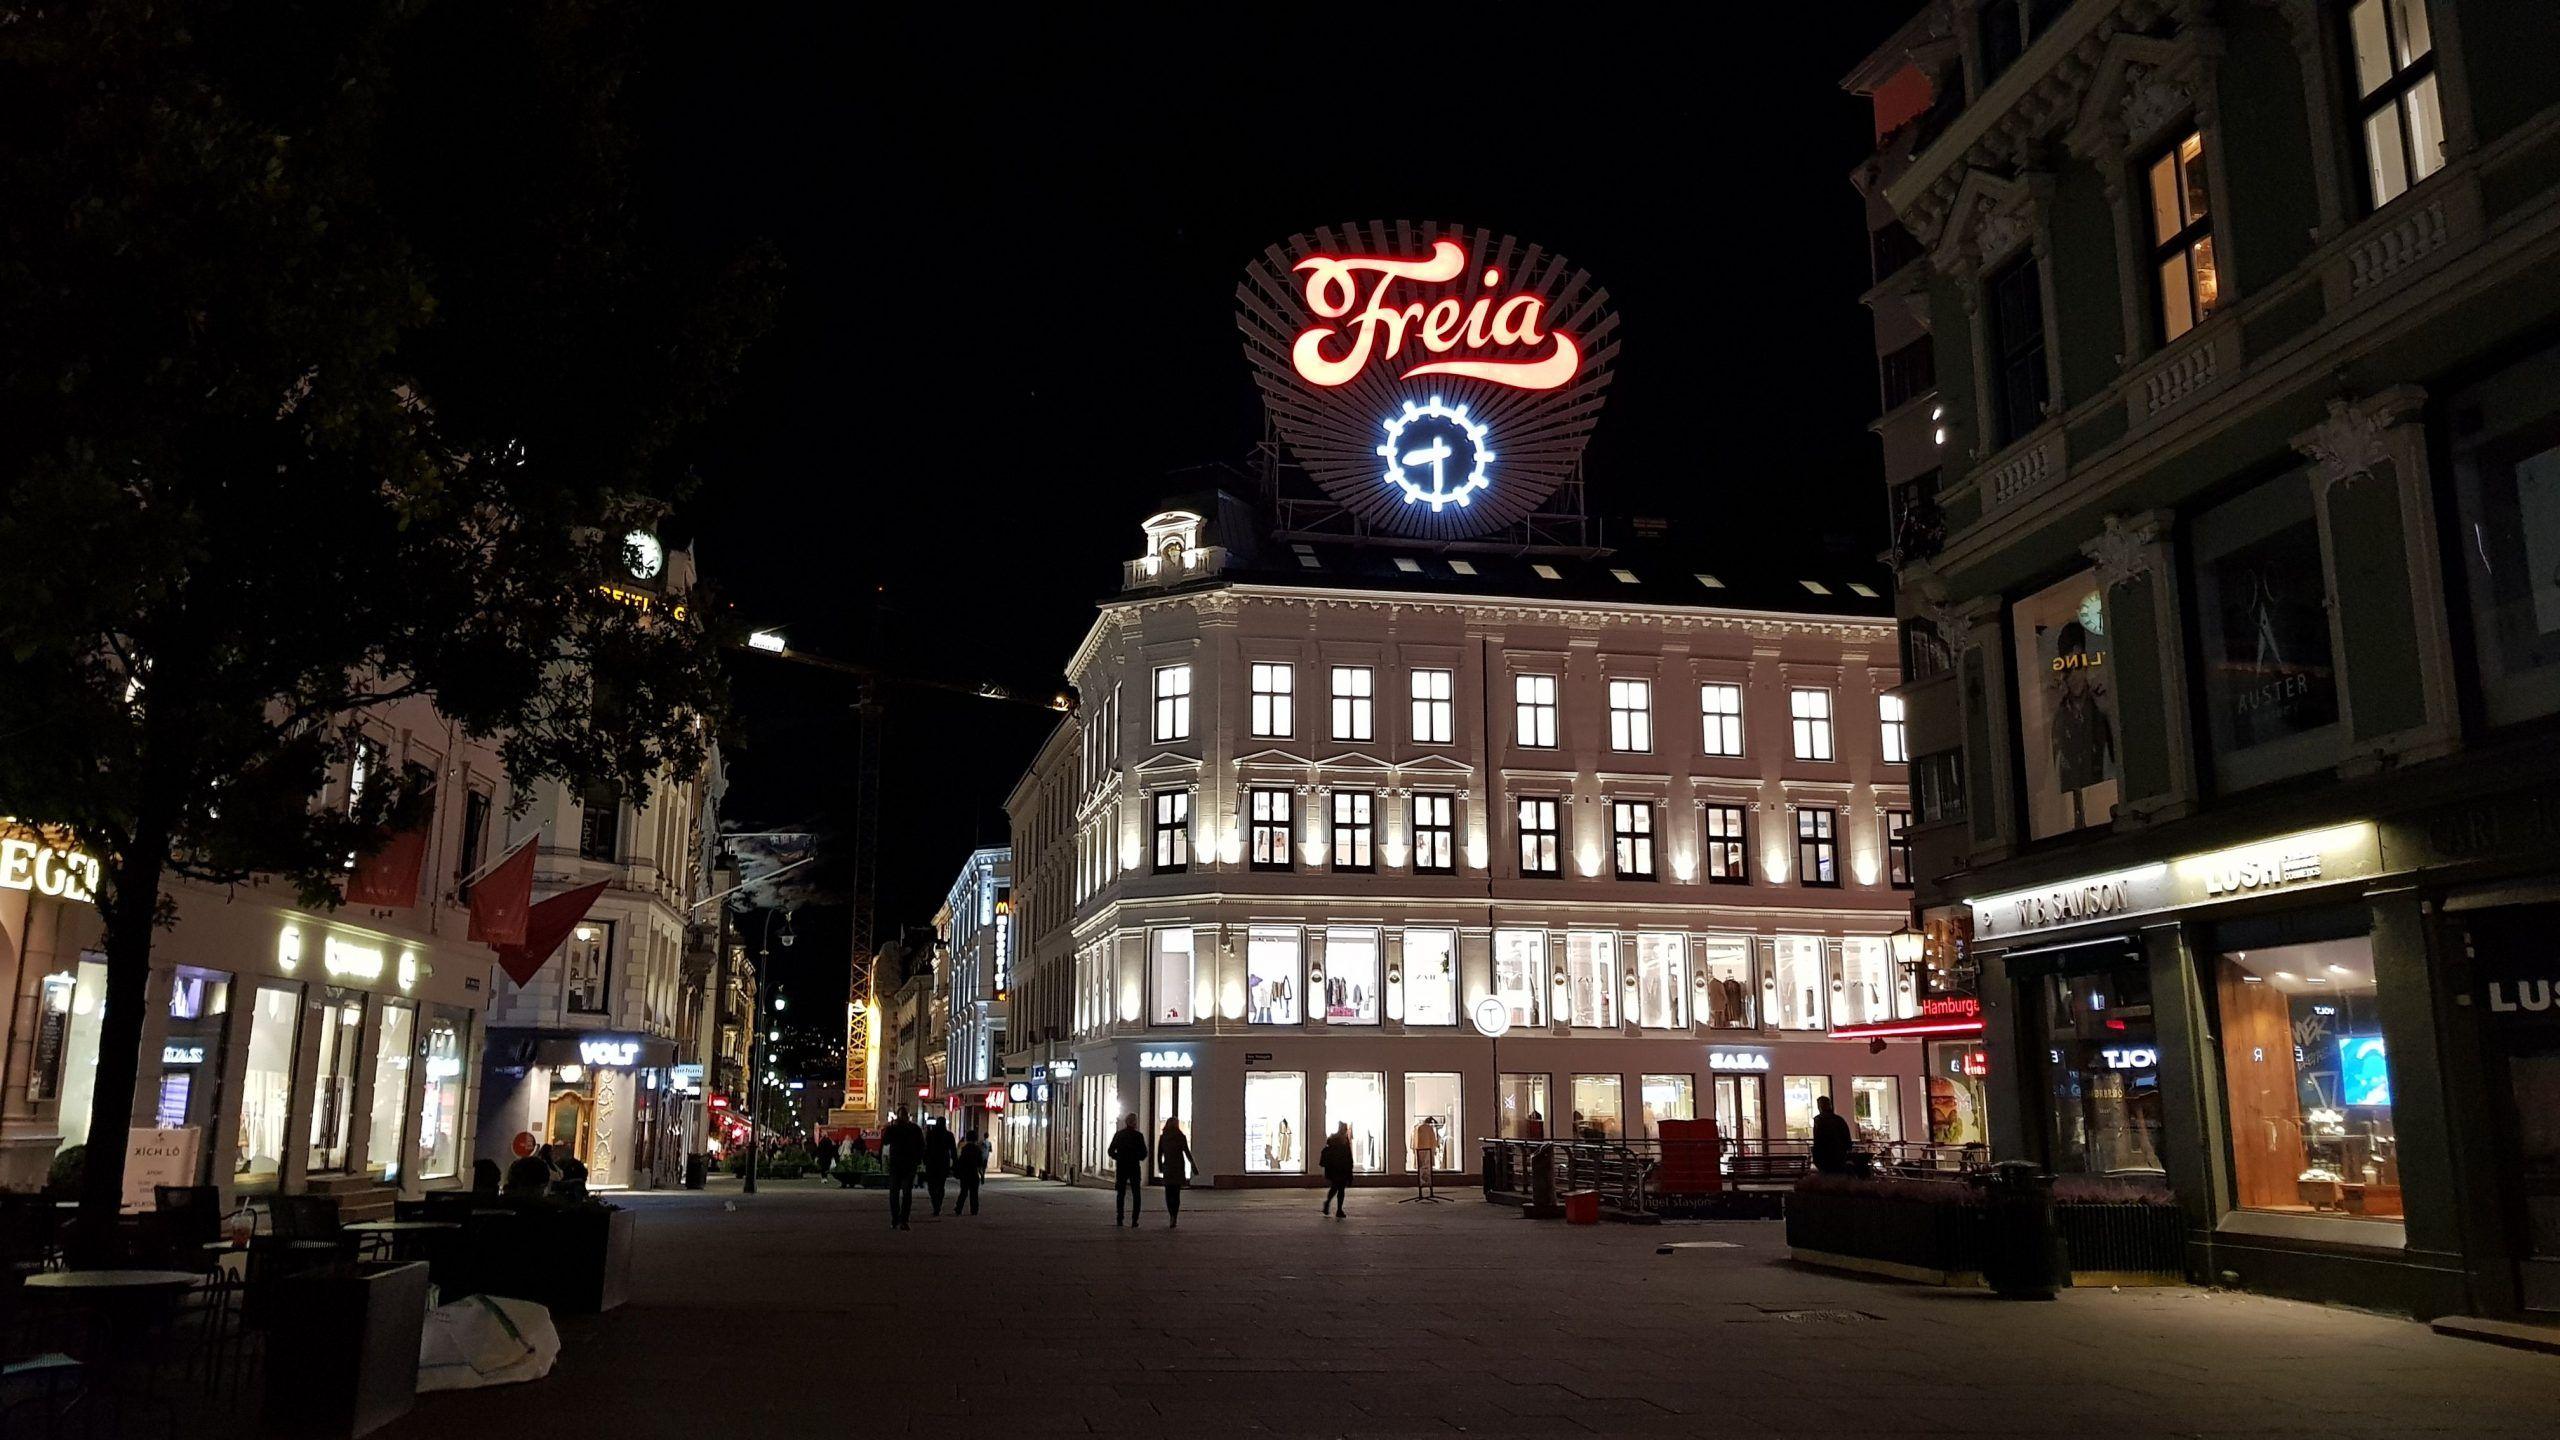 Calle peatonal Karl Johans gate con el cartel de Freia de Fondo